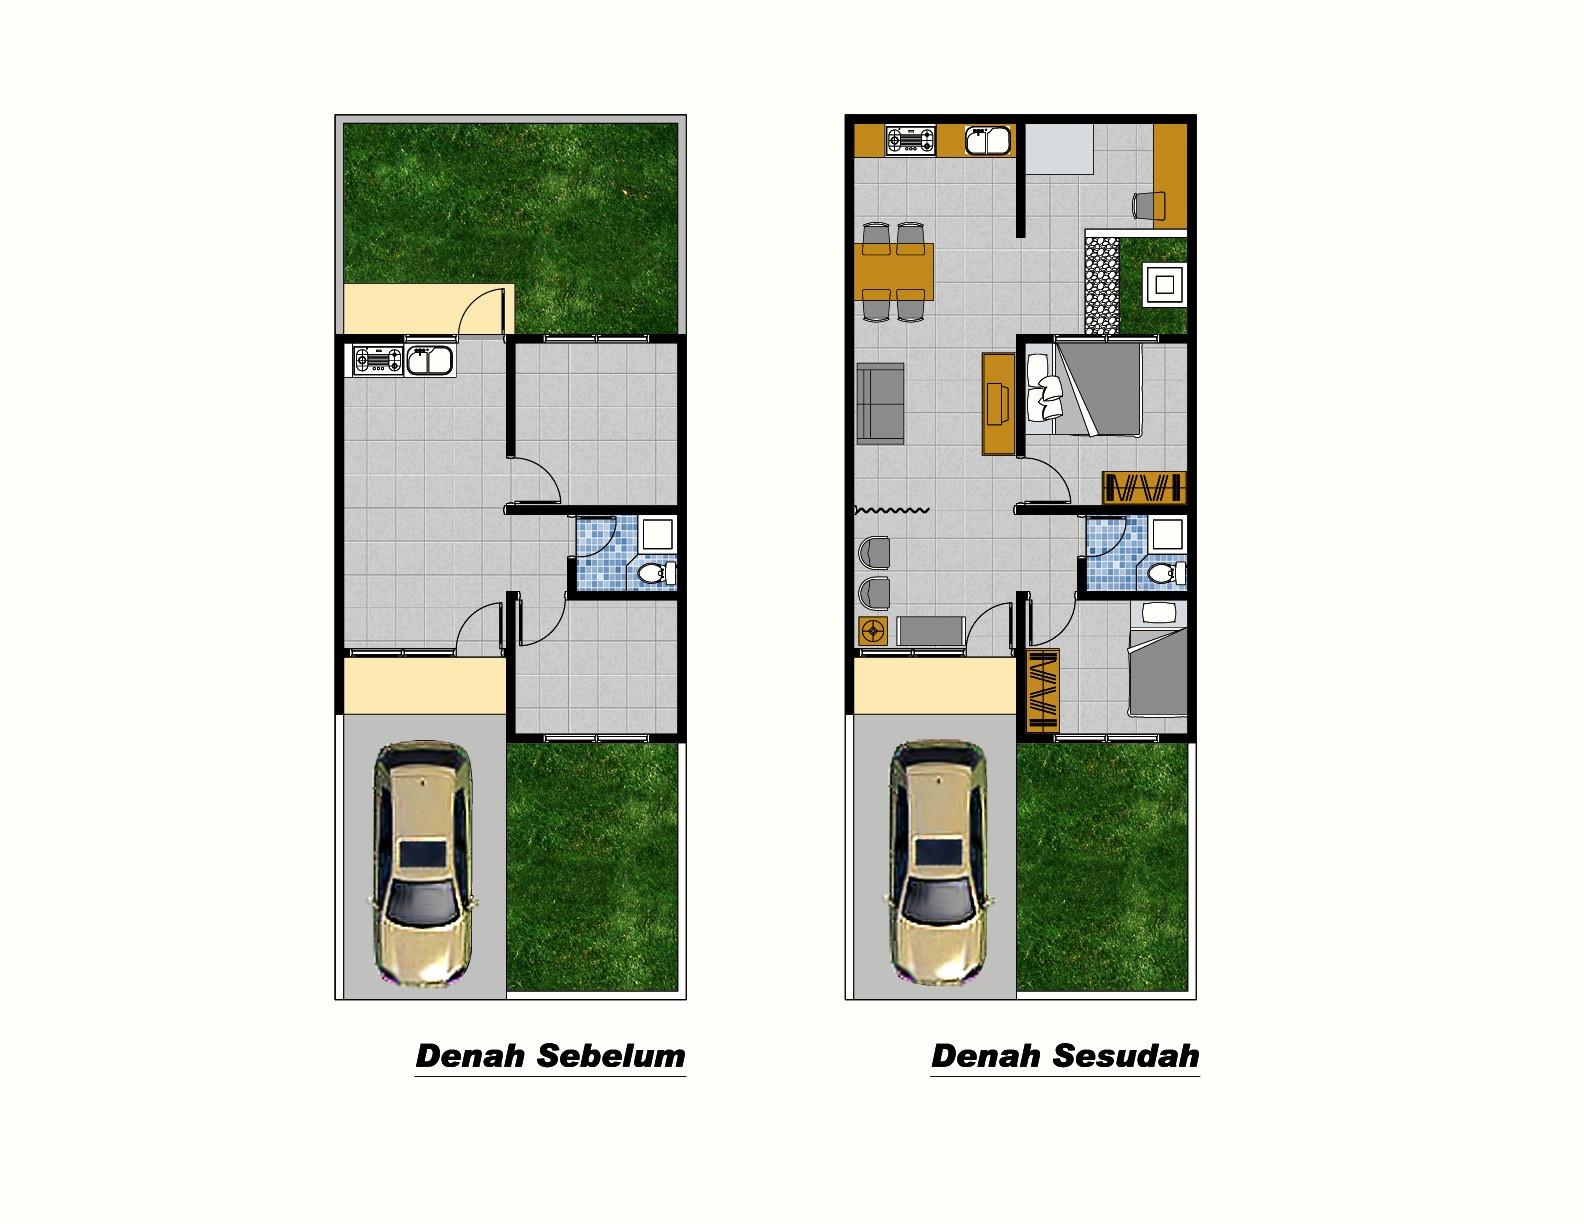 gambar denah rumah minimalis 2 lantai type 36 3